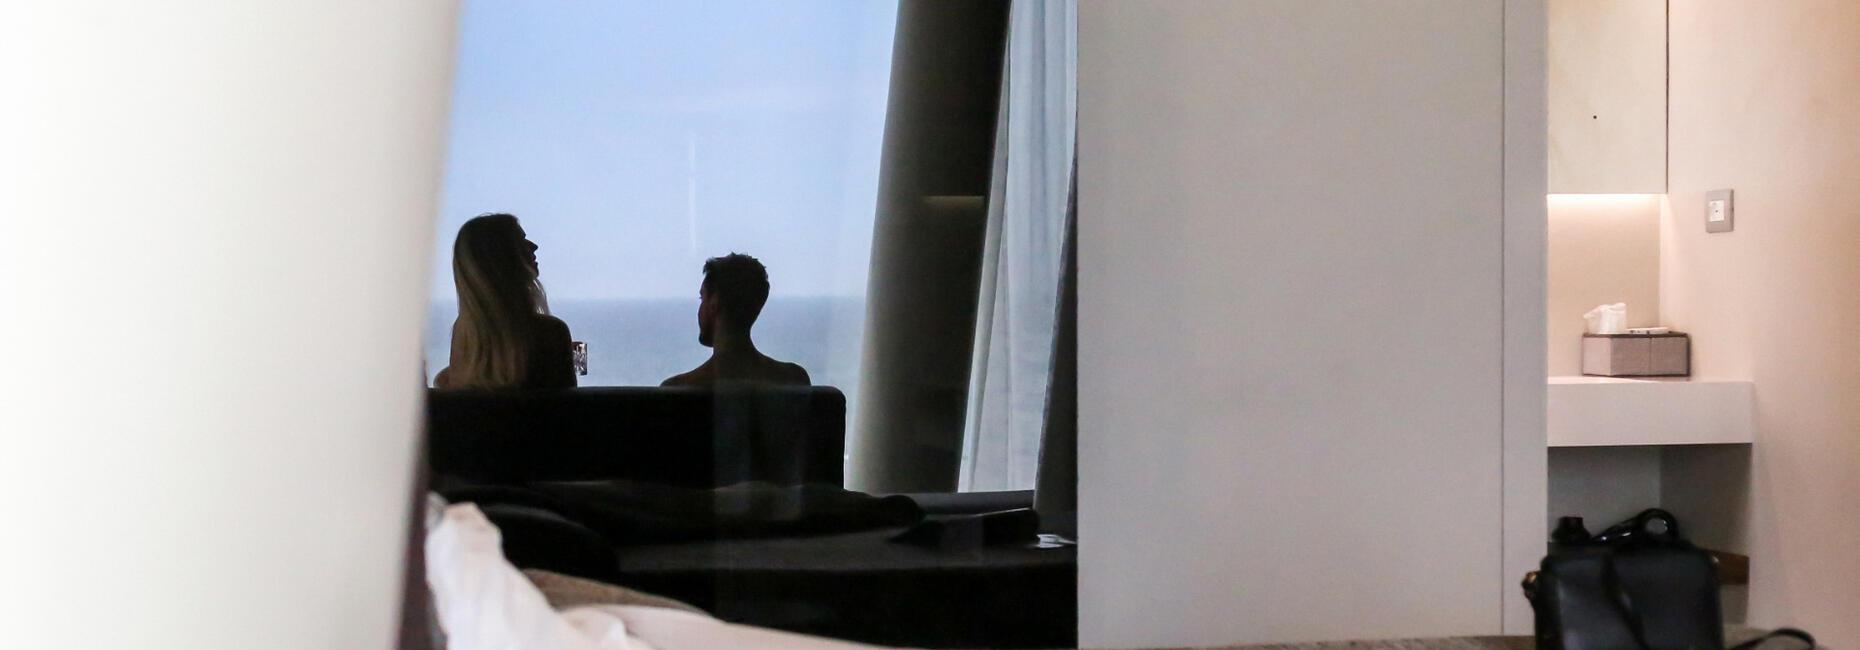 hotelcommodore it suite-vista-mare-cervia 012